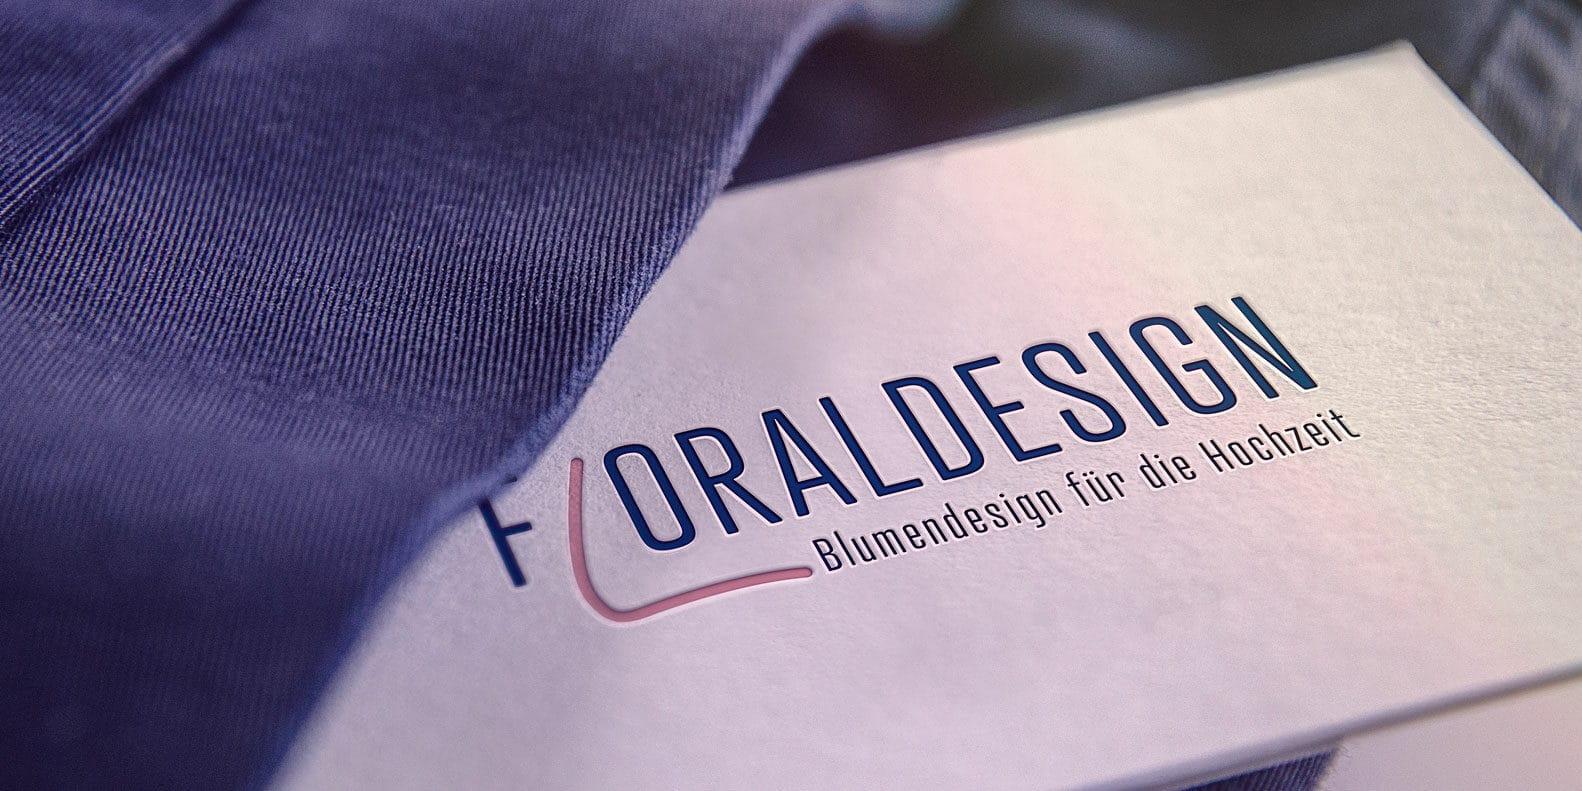 Visitenkarte mit dem Floraldesign Logo